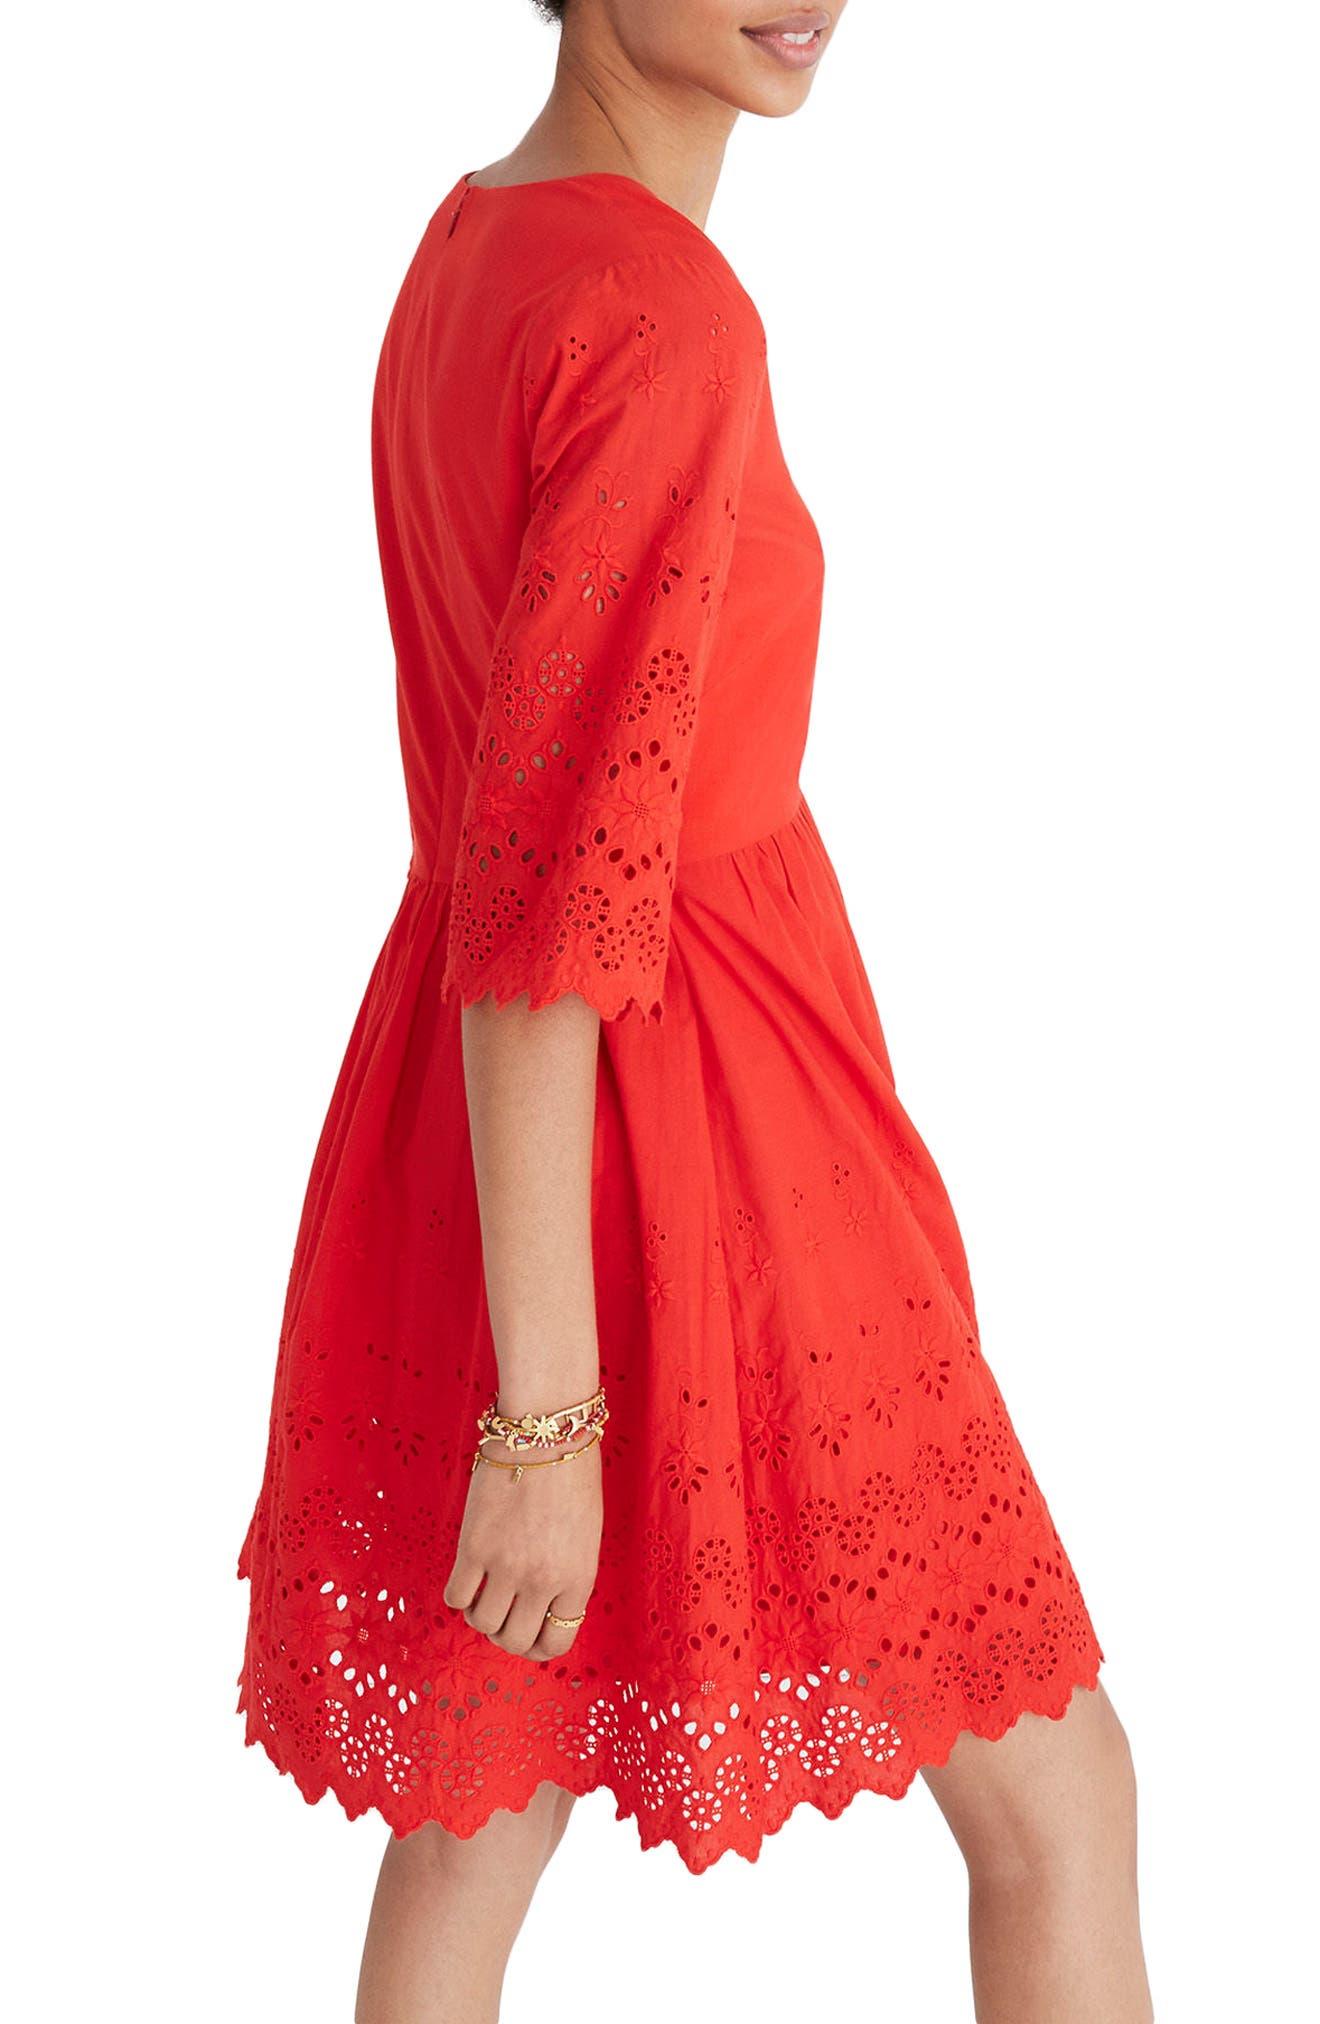 Eyelet Lattice Dress,                             Alternate thumbnail 3, color,                             Bright Poppy